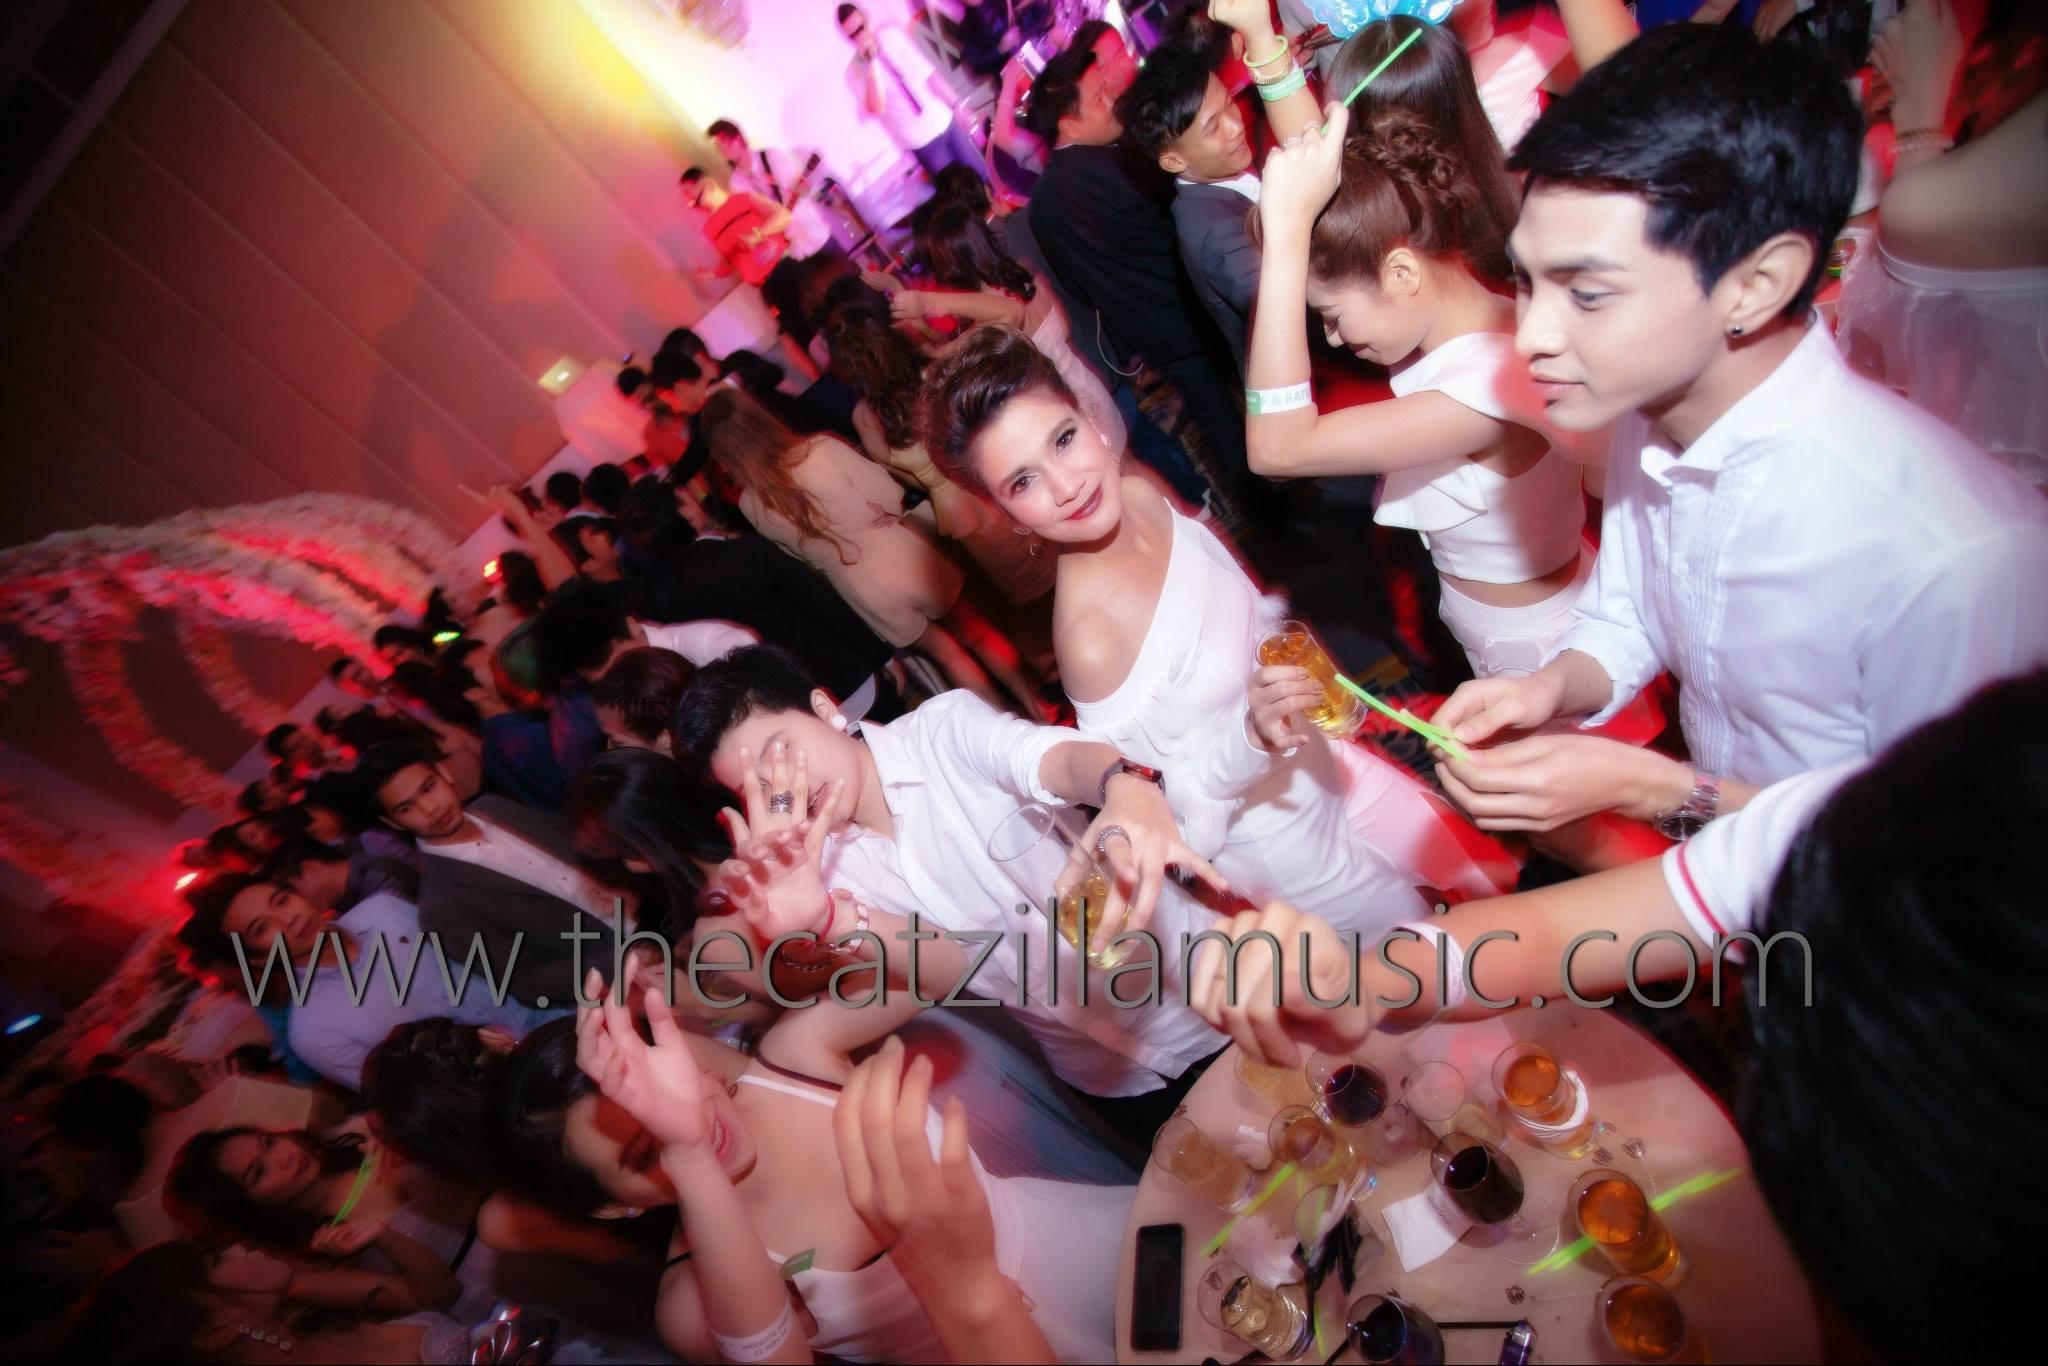 After Party งานแต่งงาน วงดนตรีงานเลี้ยง บุ๋นแบนด์ วงดนตรีสด After party wedding วงดนตรีงานแต่งงาน thecatzillamusic